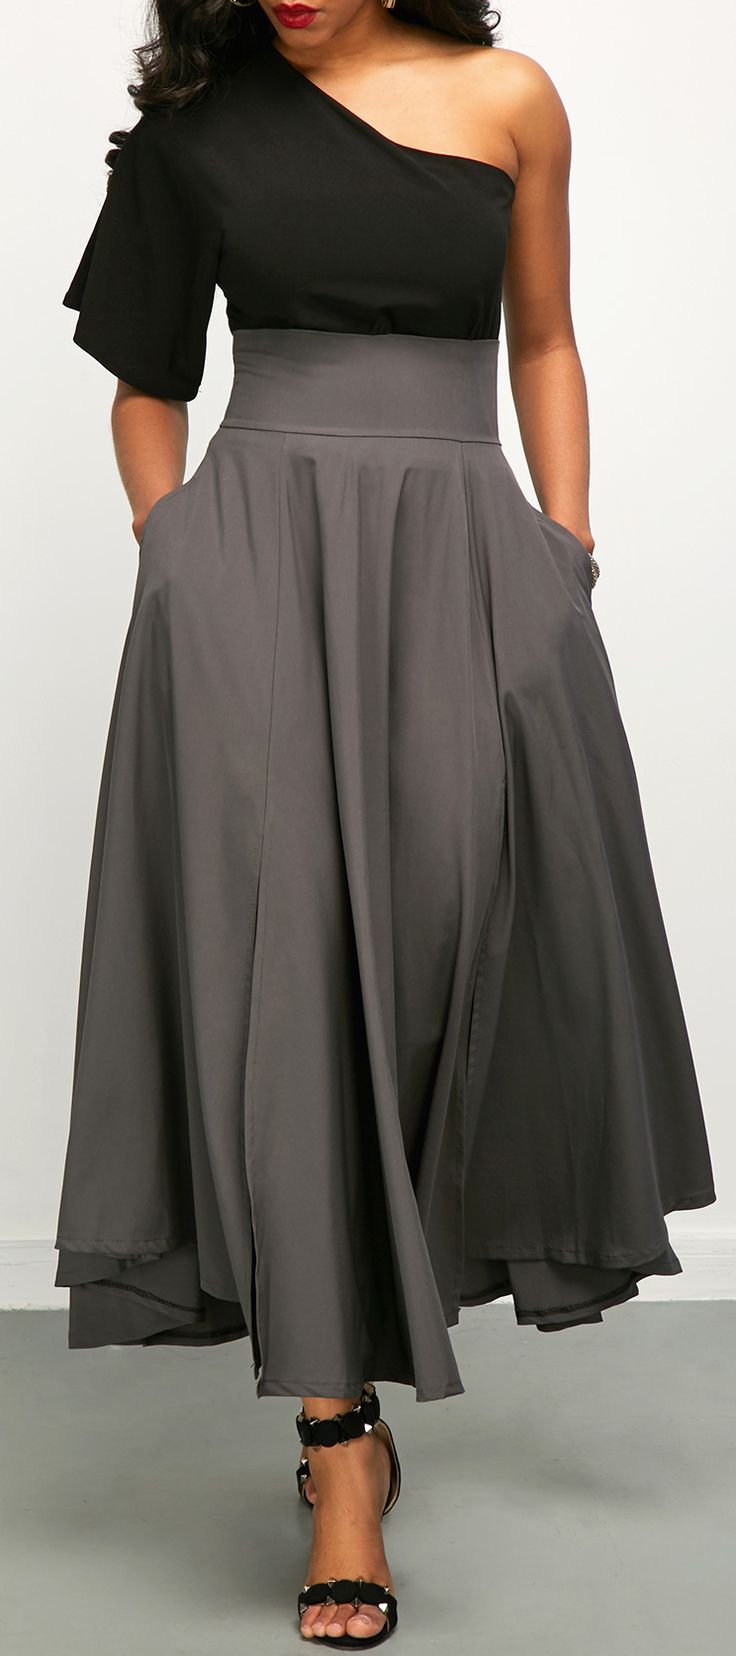 One Shoulder Top and Front Slit Belted Skirt#dress#africanstyle